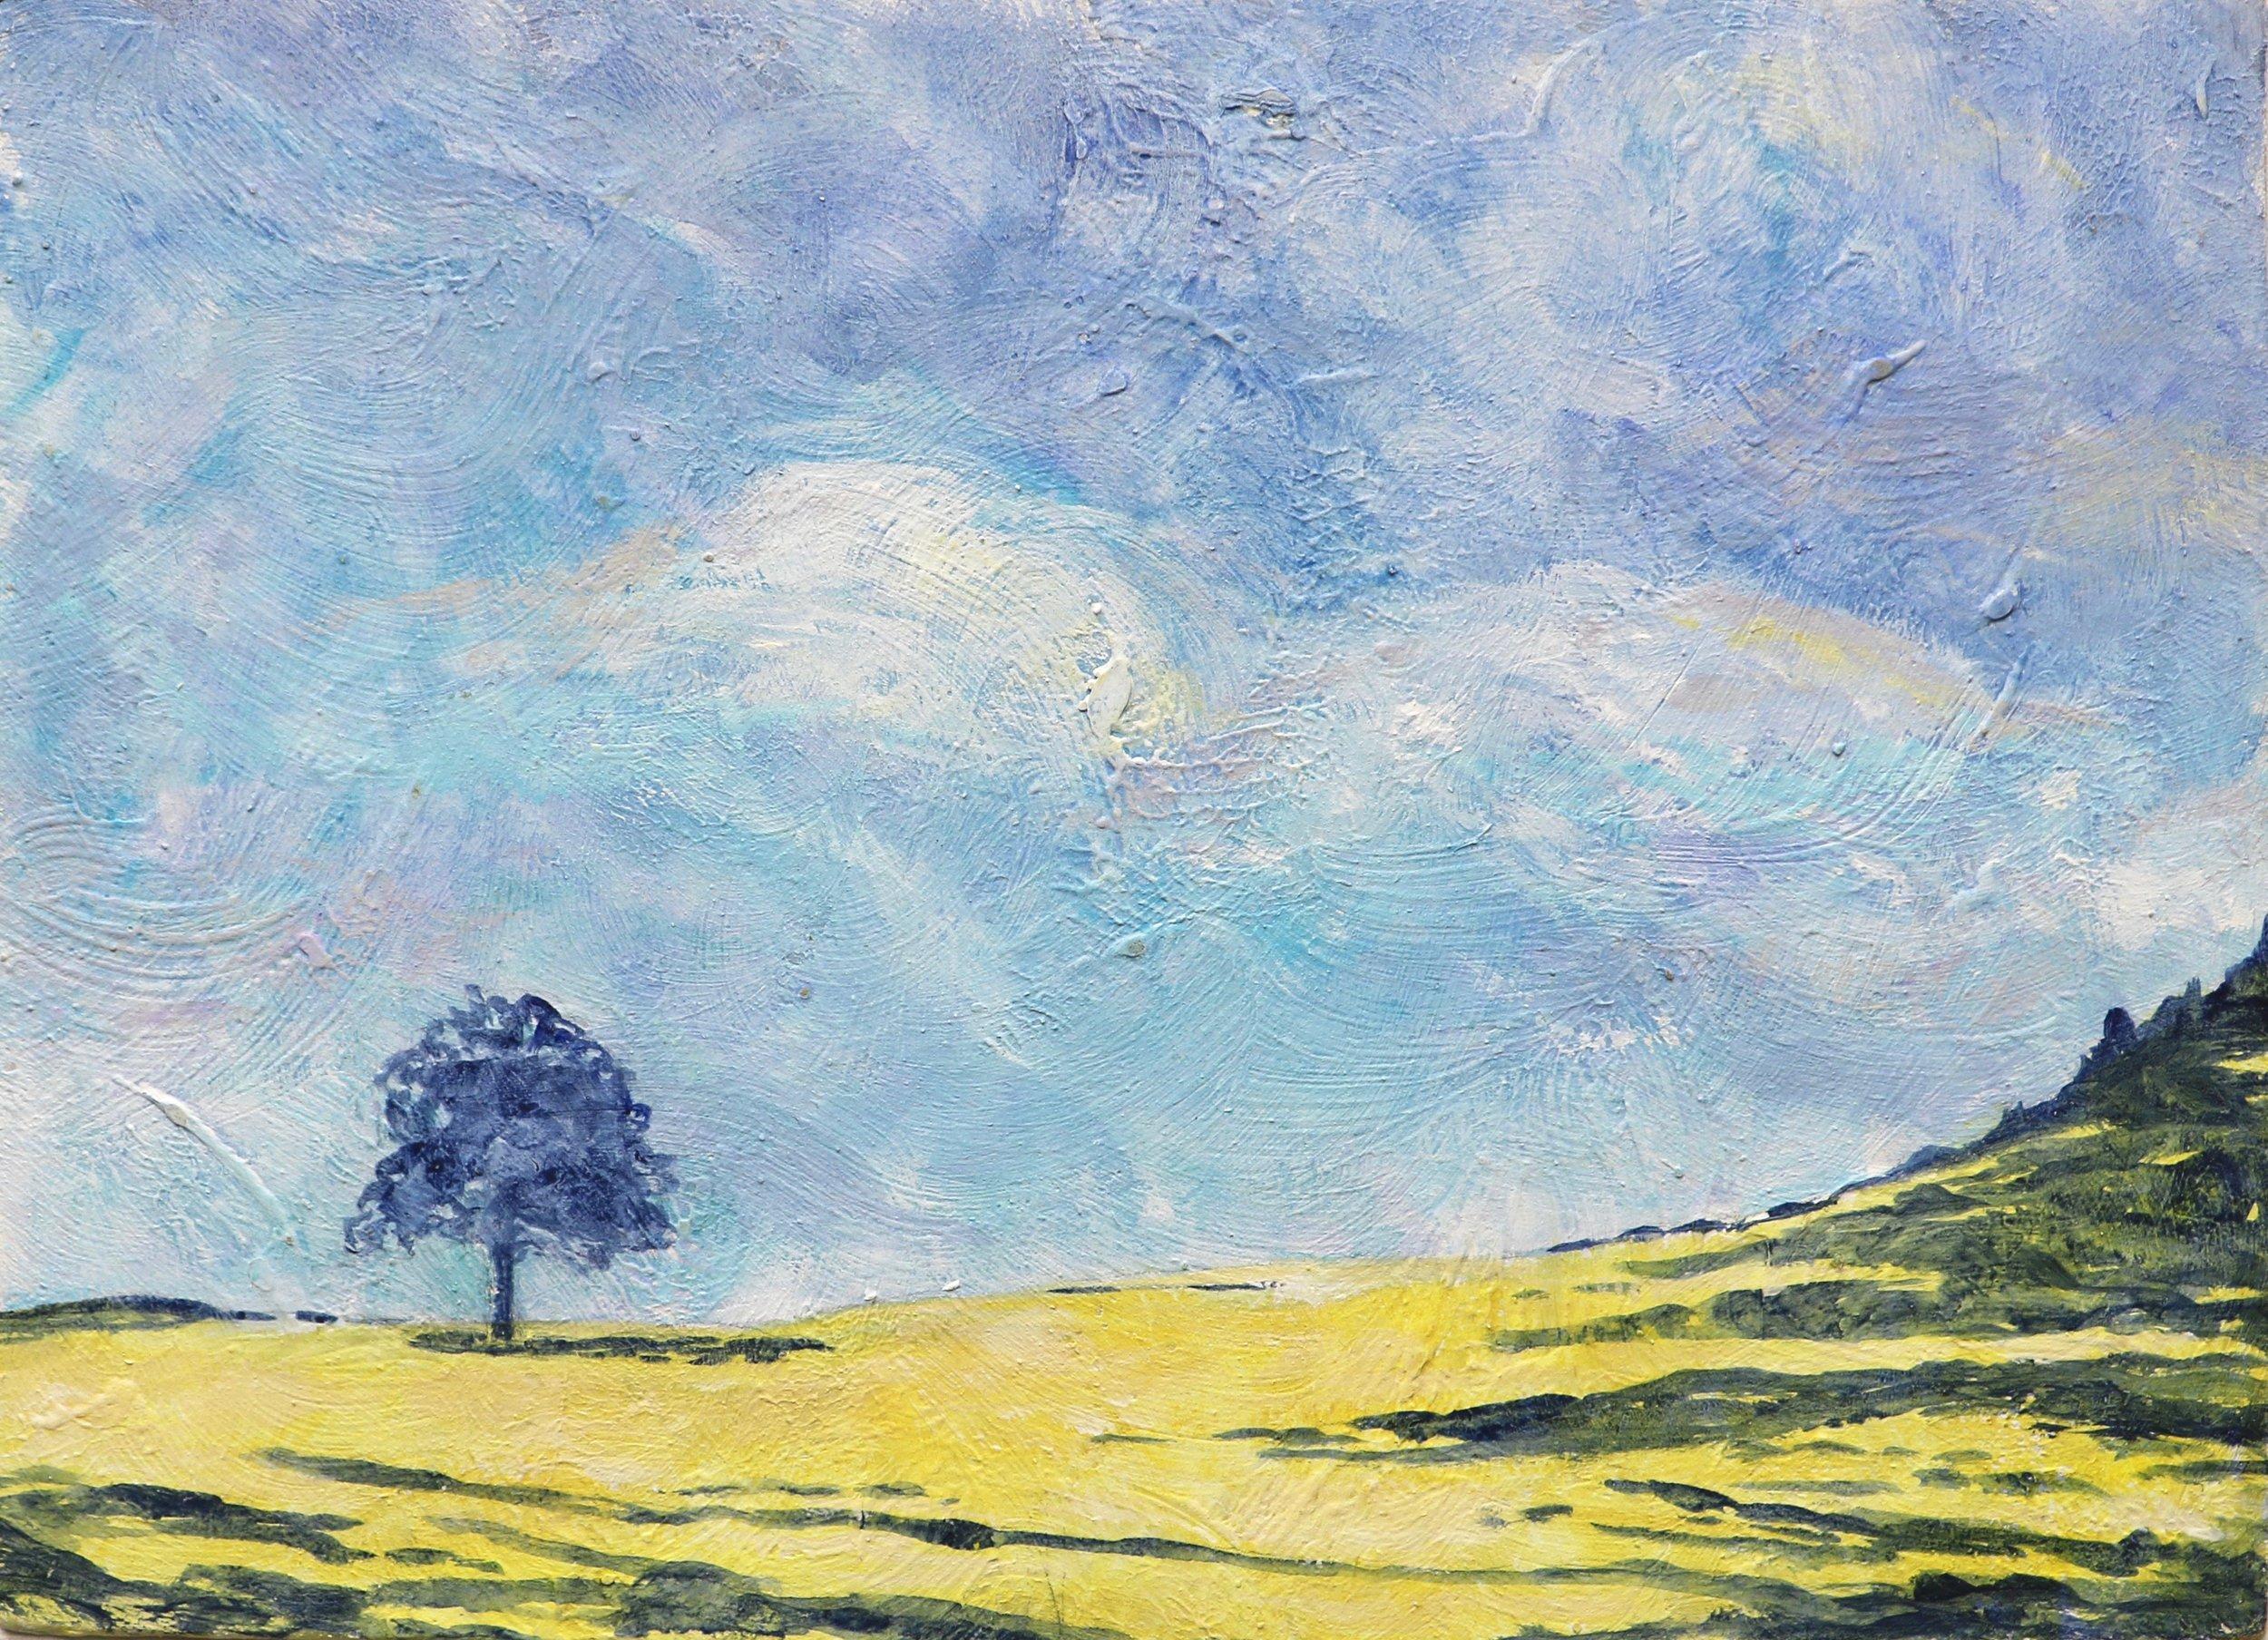 Blue Skies over Lone Tree